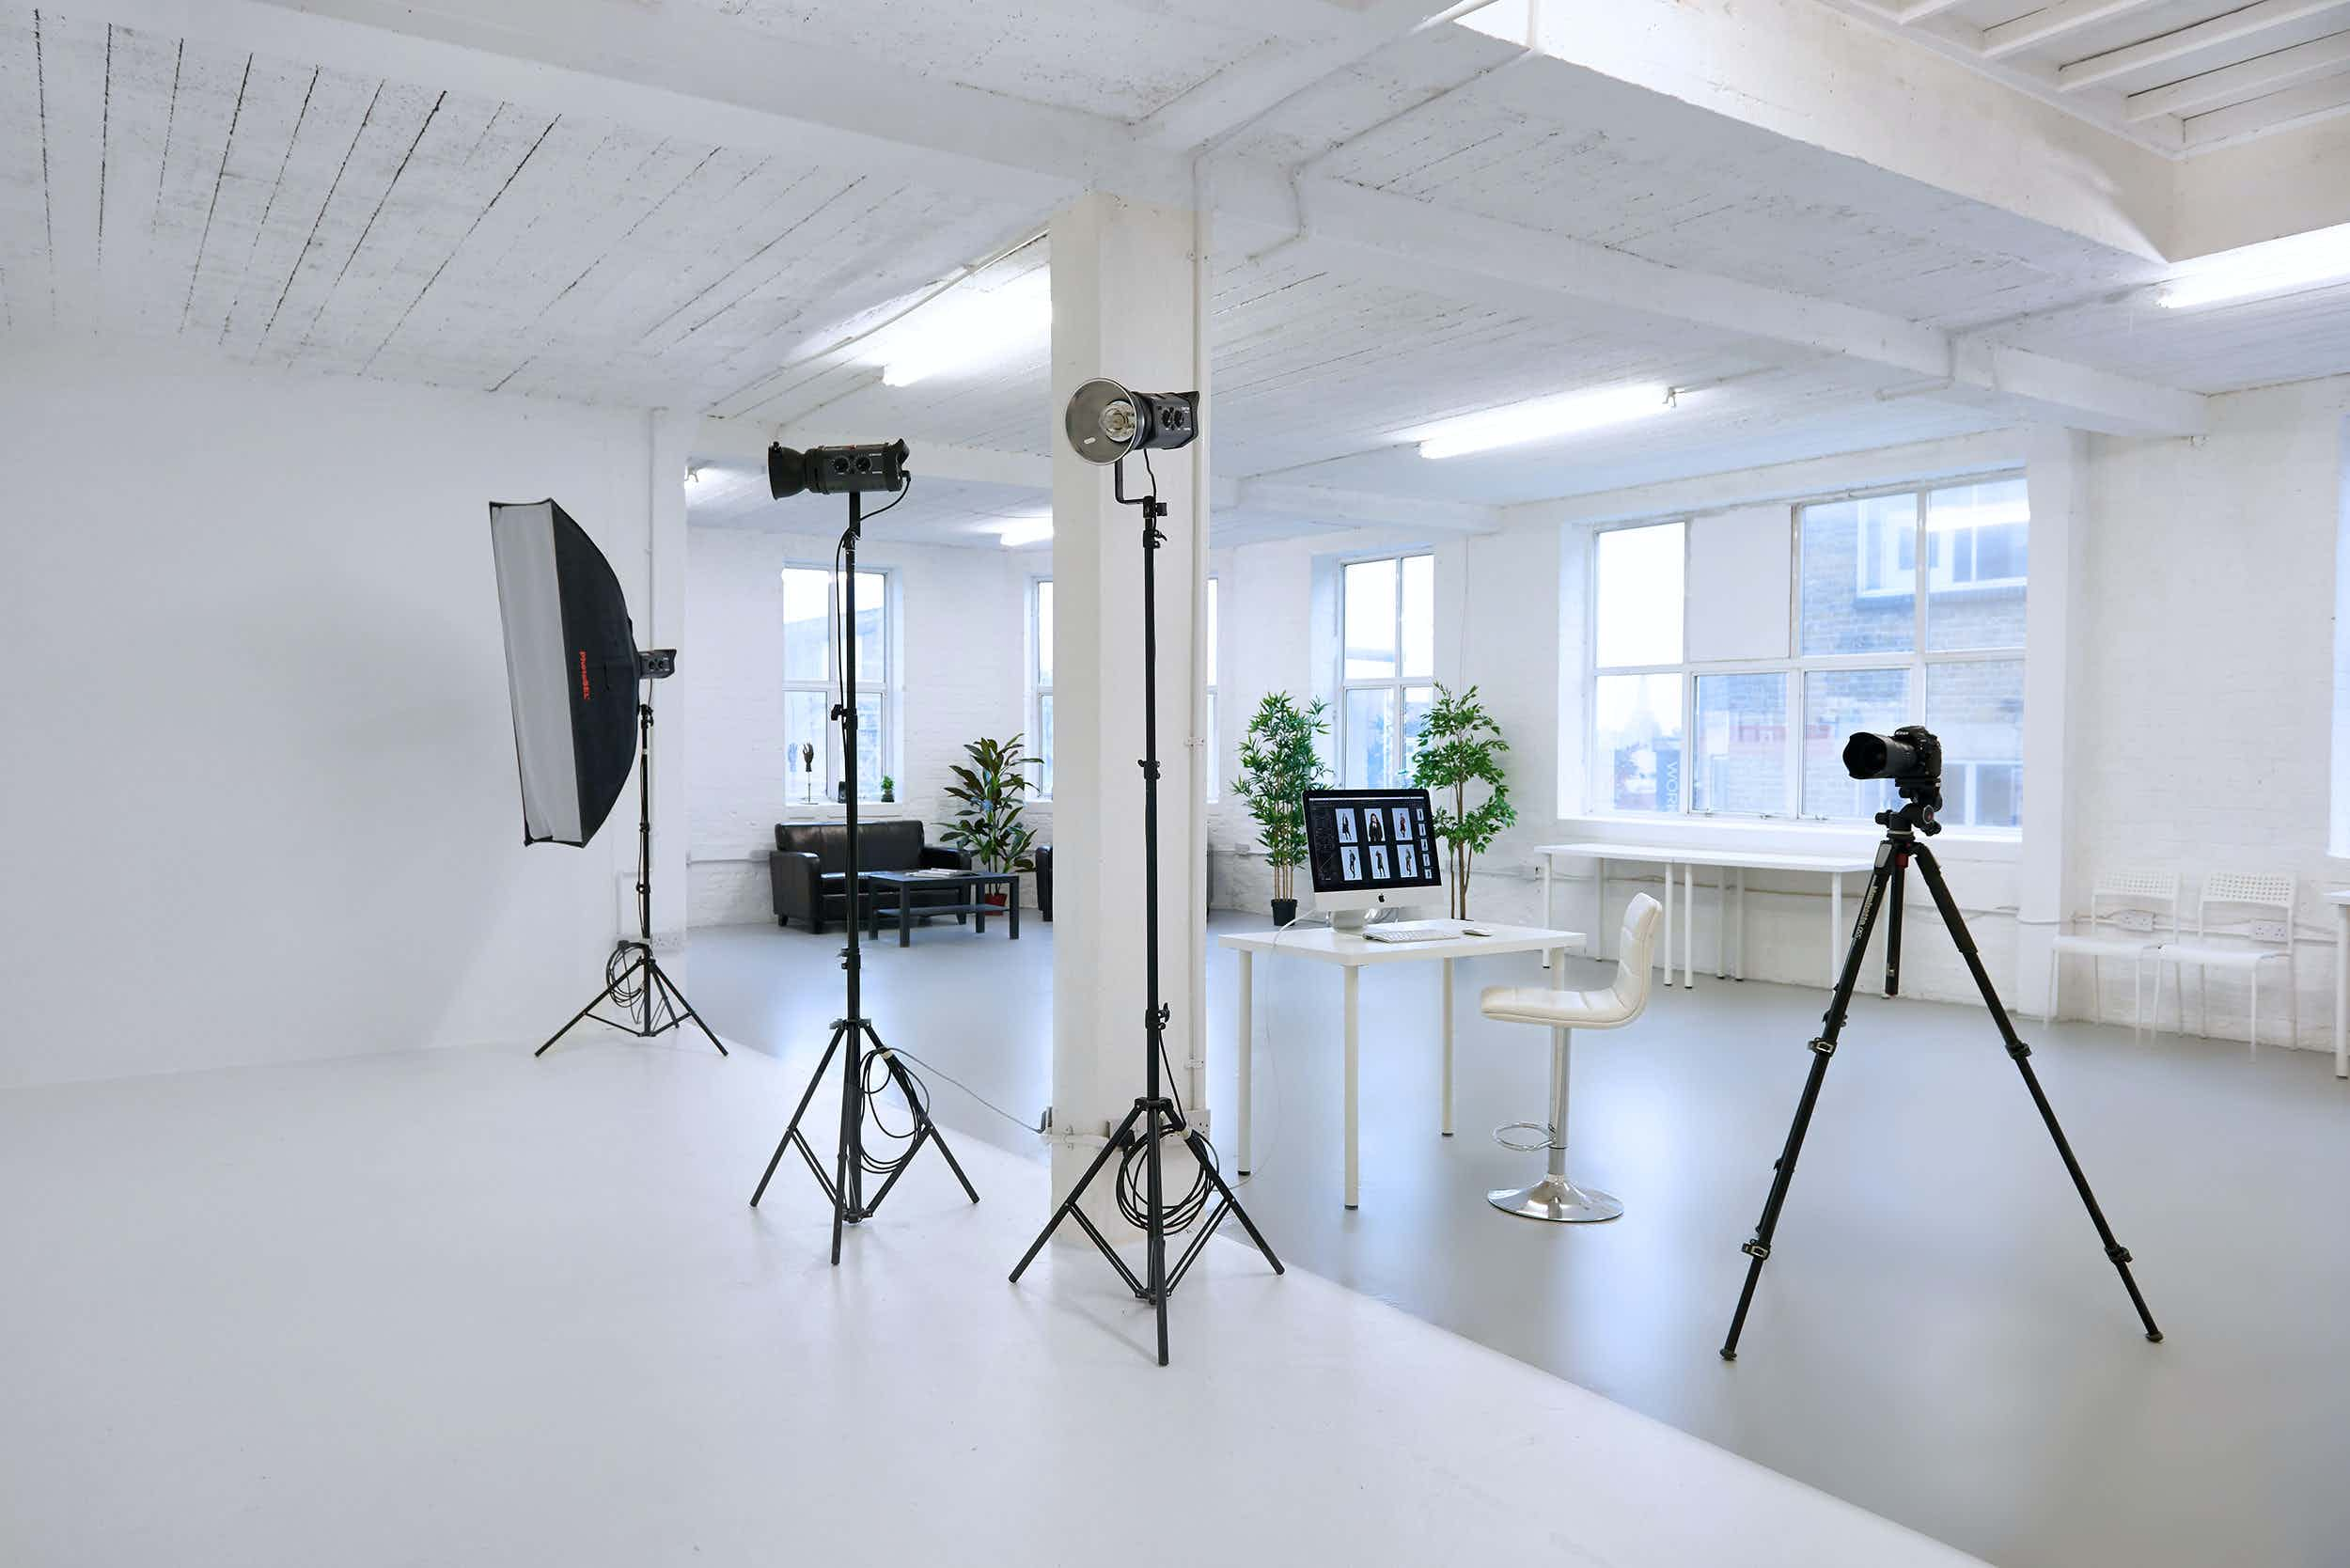 Day Light Photography Studio and Infinity Cove, Glassmint Studio